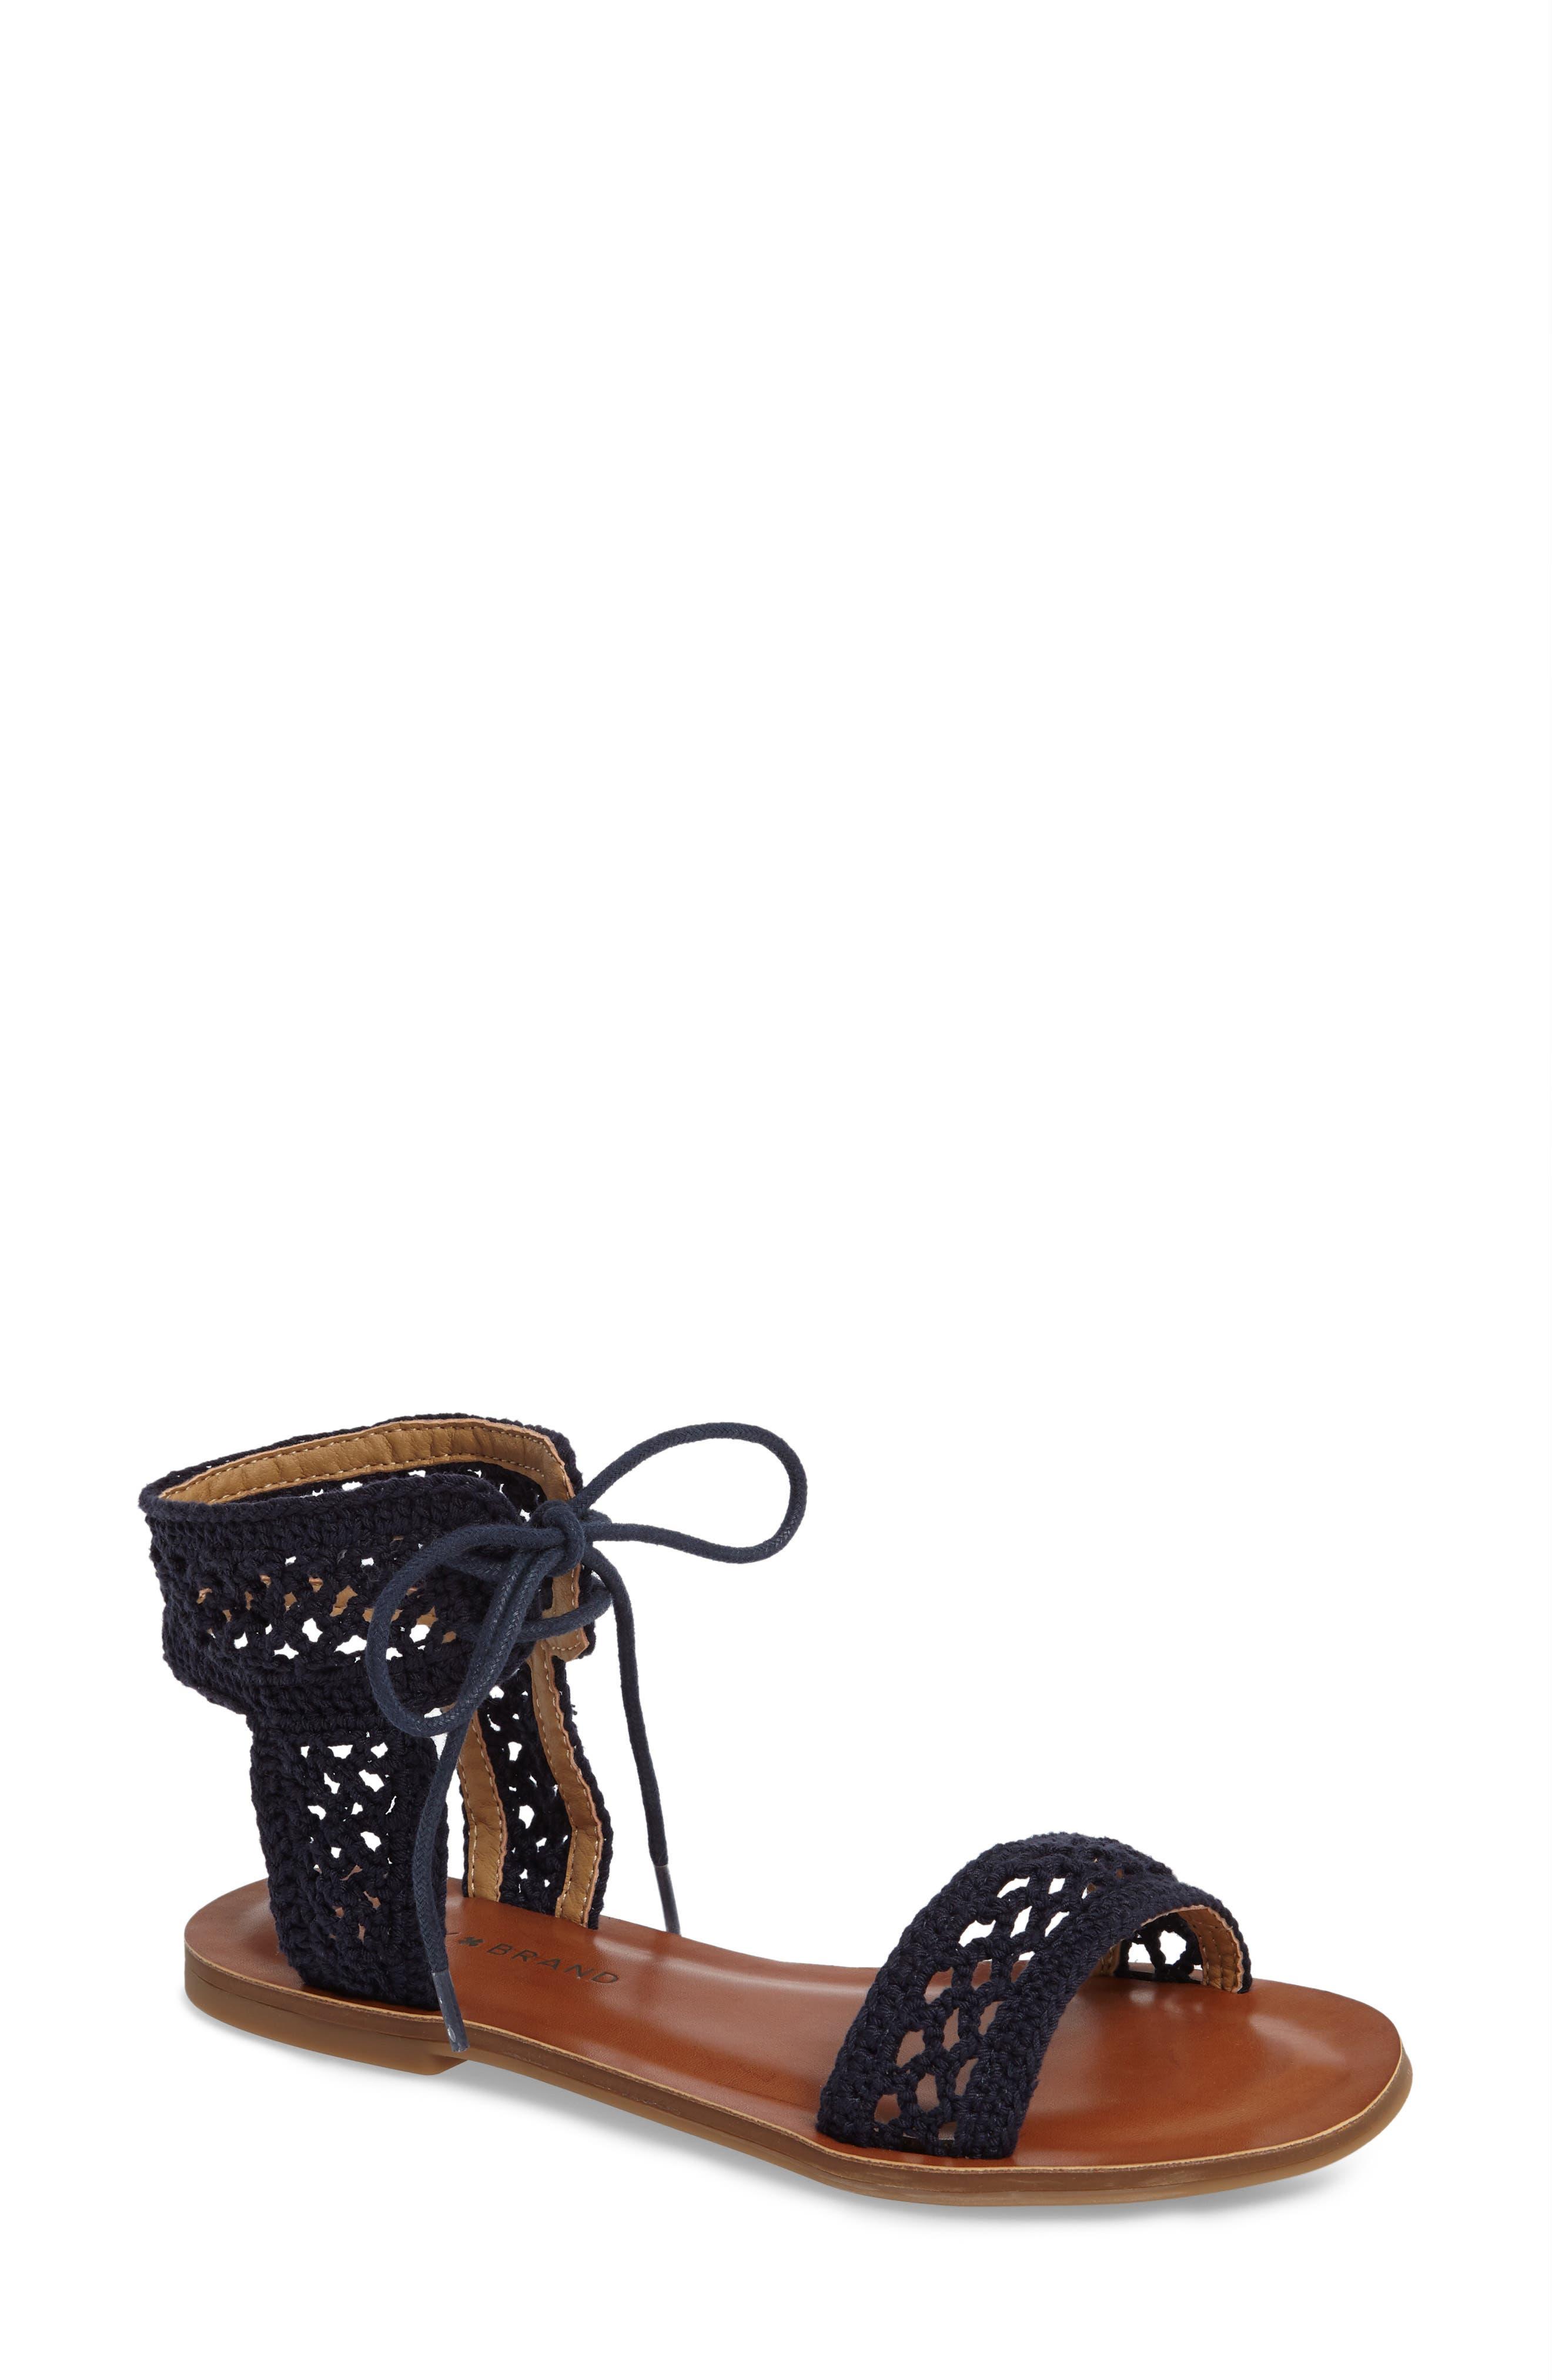 Alternate Image 1 Selected - Lucky Brand Ariah Ankle Tie Sandal (Women)